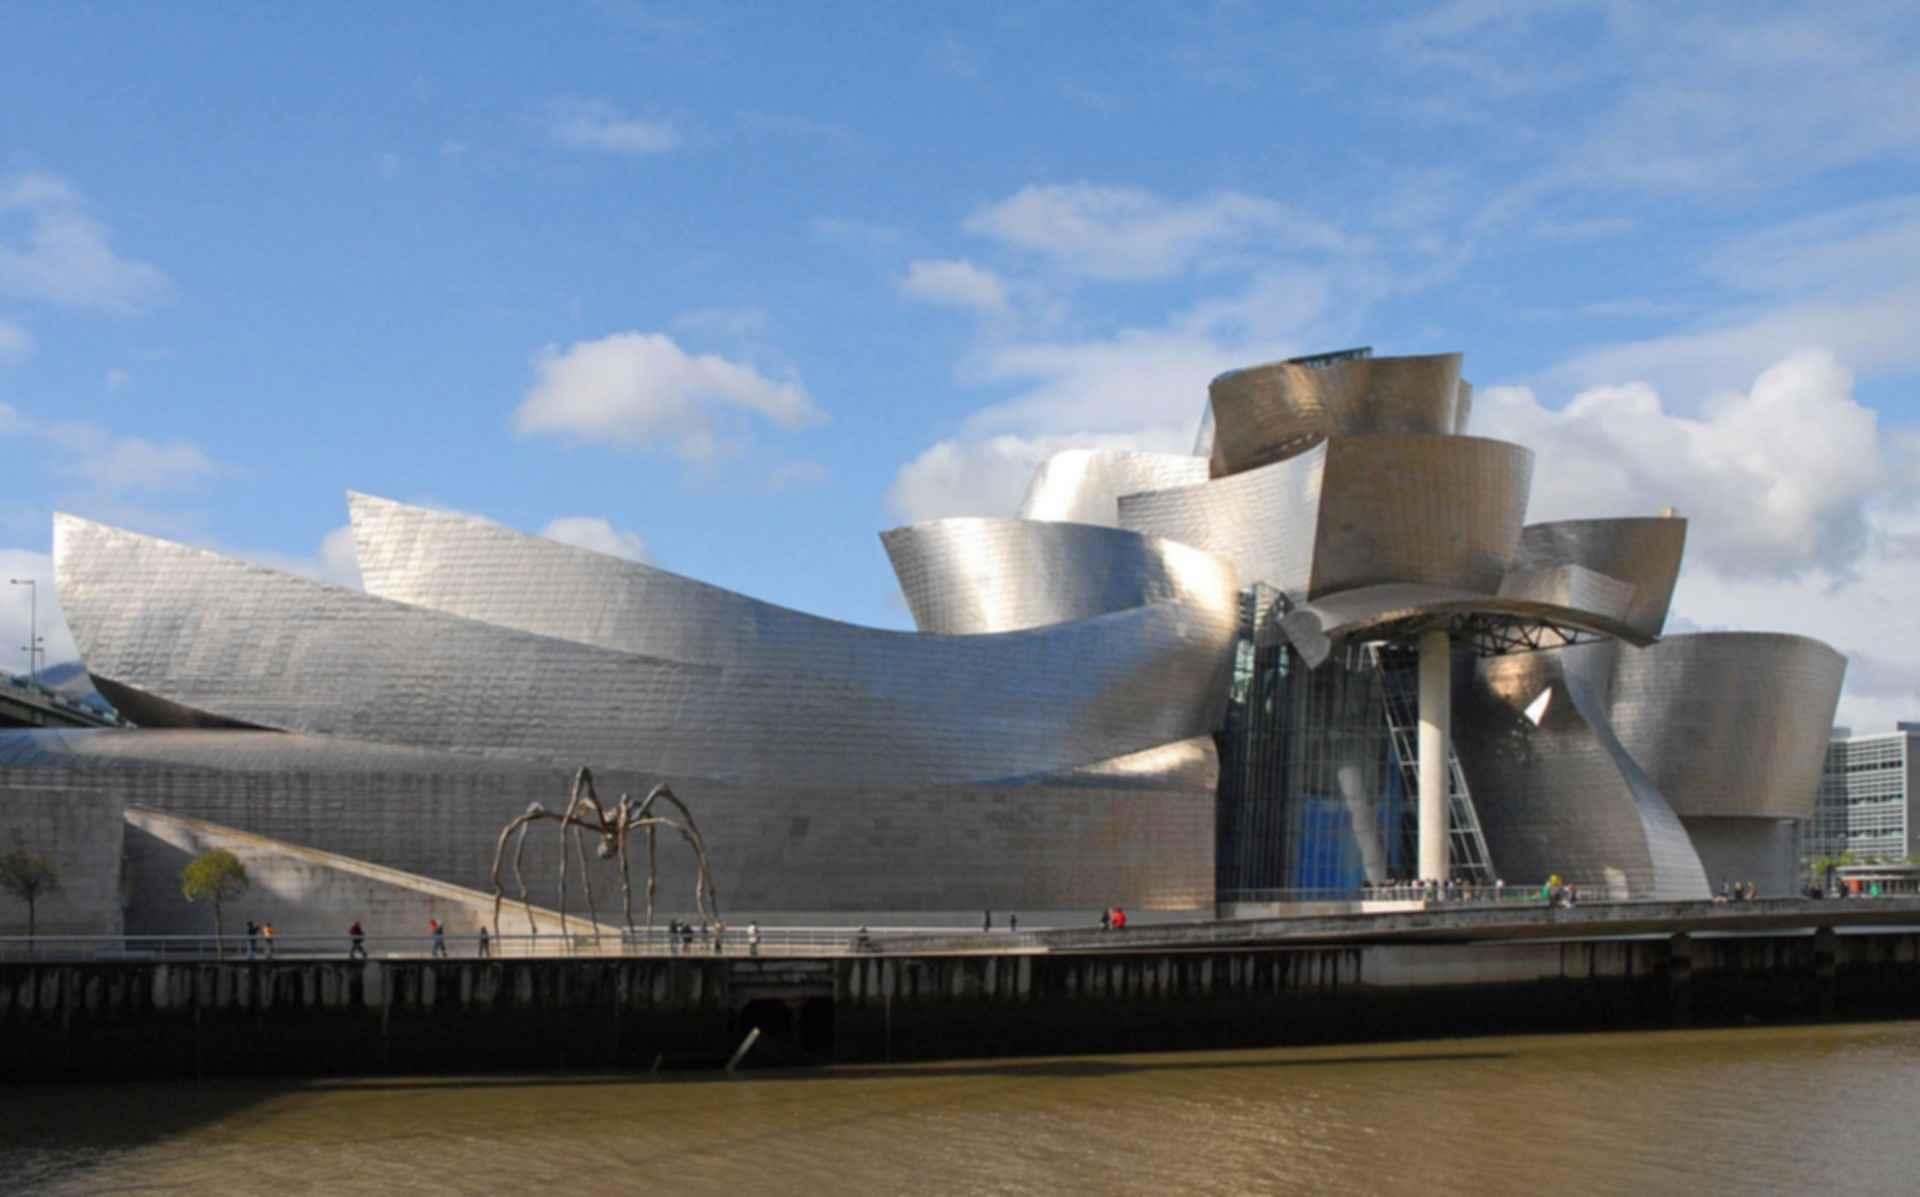 Guggenheim Museum Bilbao - Front Exterior